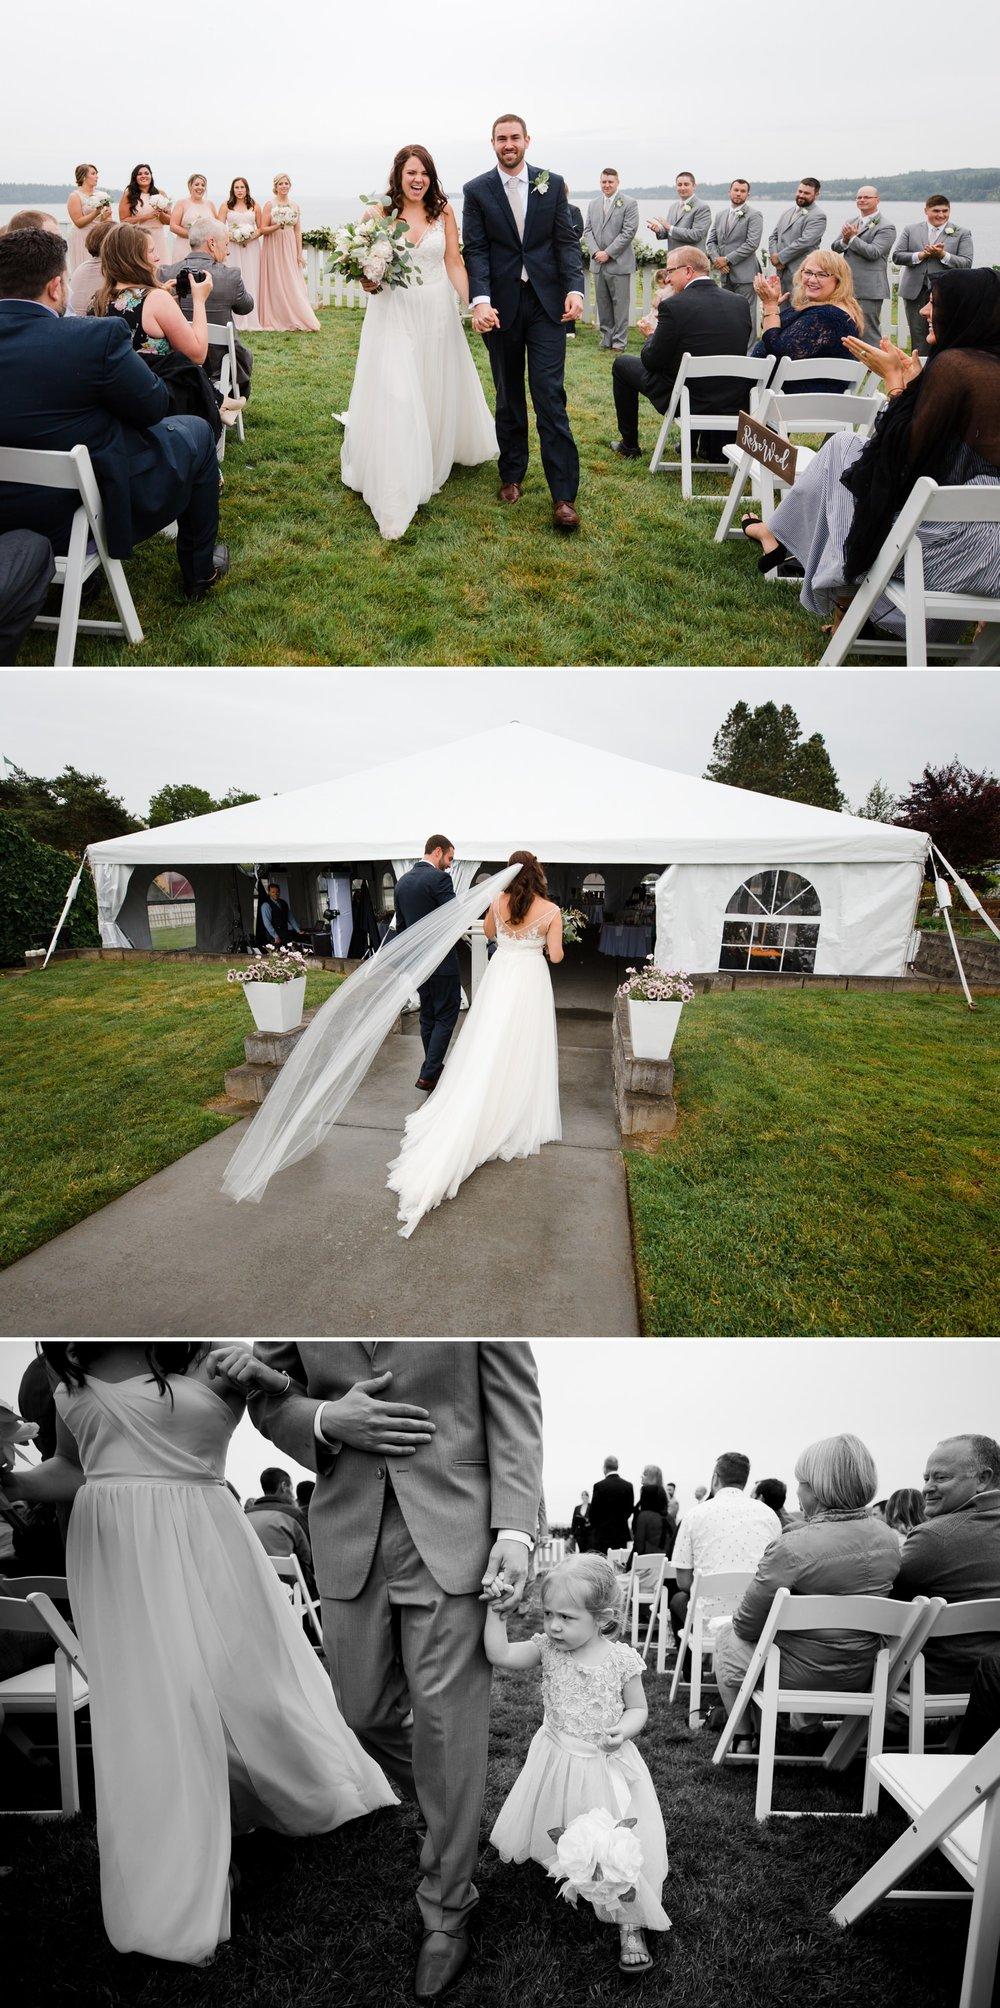 20-port-gamble-wedding-venue.jpg